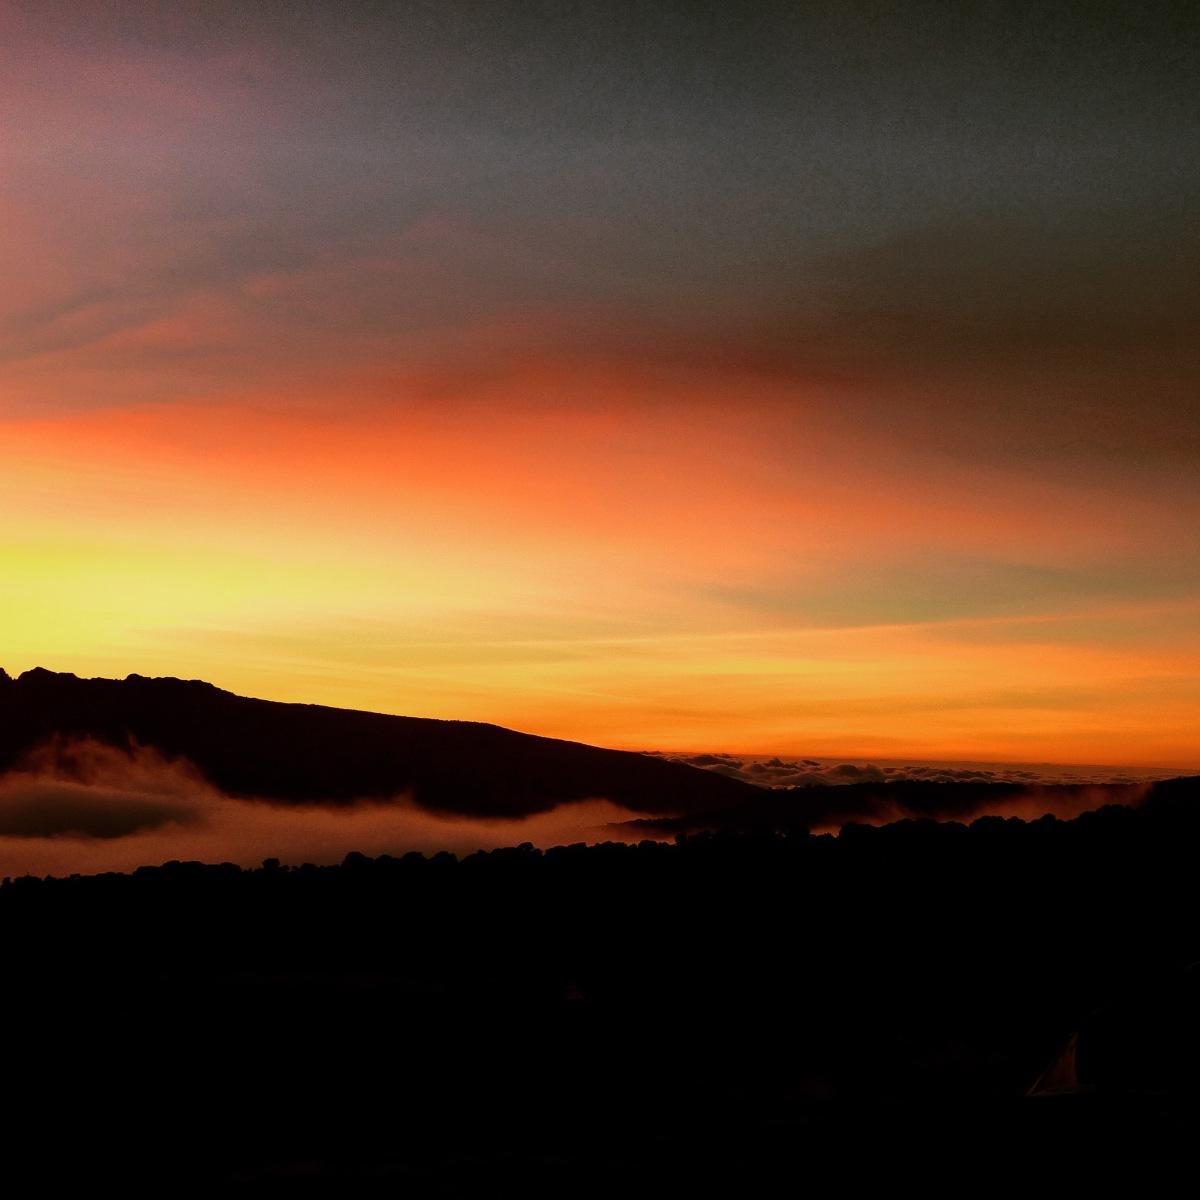 Sunset on Mount Kilimanjaro Tanzania